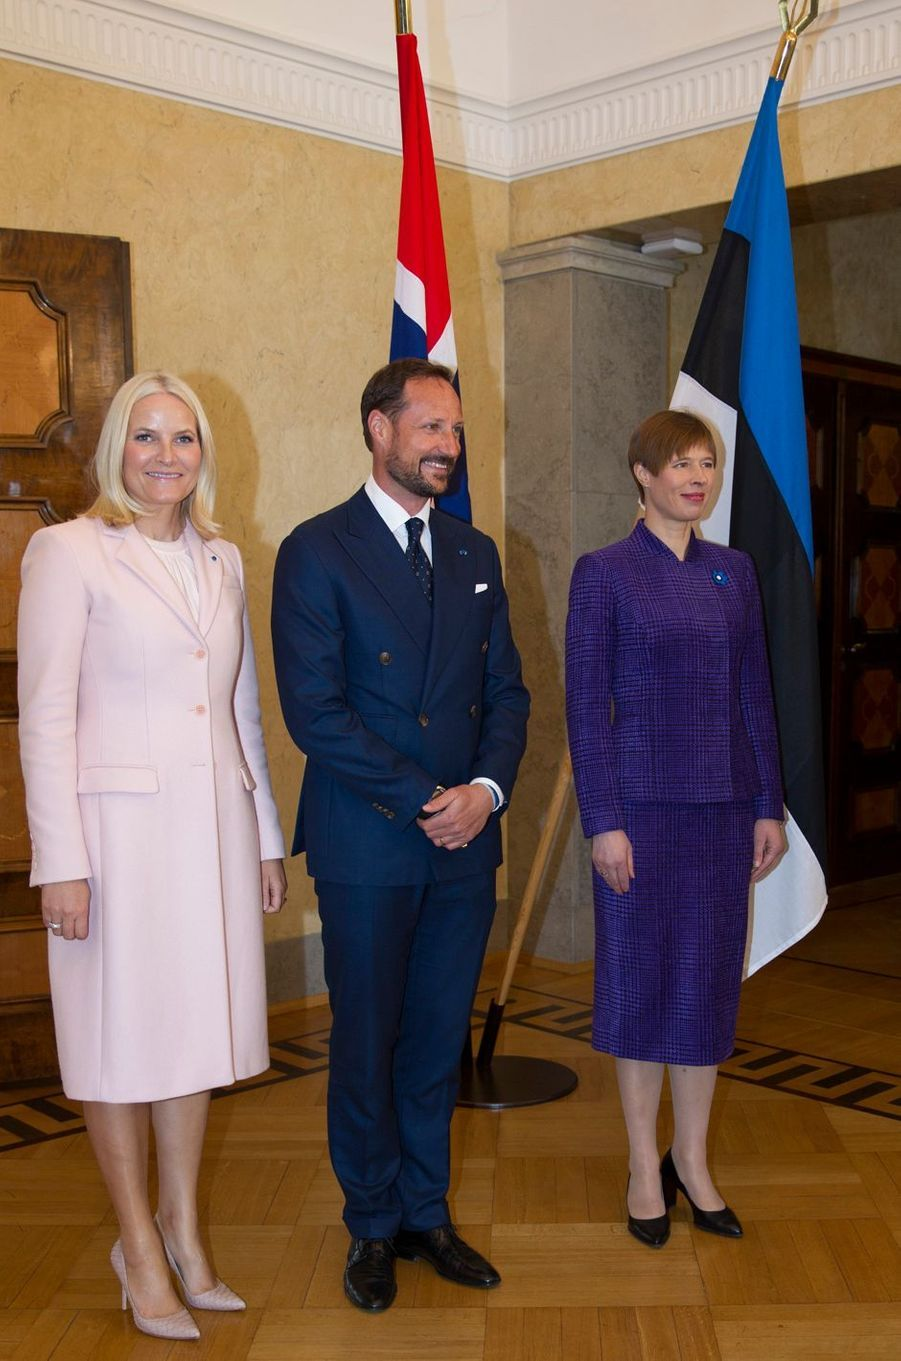 La princesse Mette-Marit et le prince Haakon de Norvège avec la présidente estonienne Kersti Kaljulaid à Tallinn, le 25 avril 2018